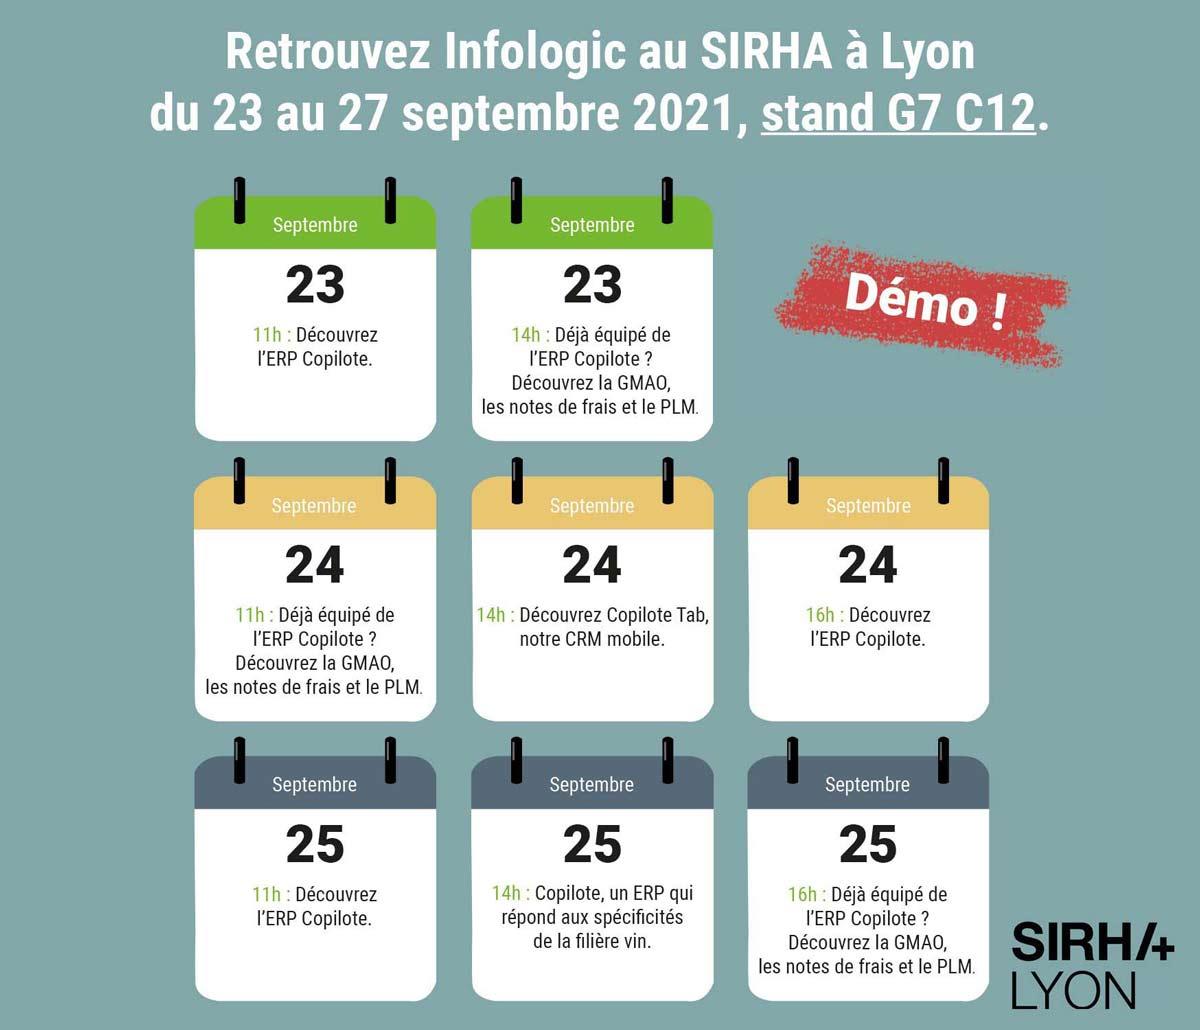 Programme salon SIRHA démonstration Infologic ERP agroalimentaire Copilote.